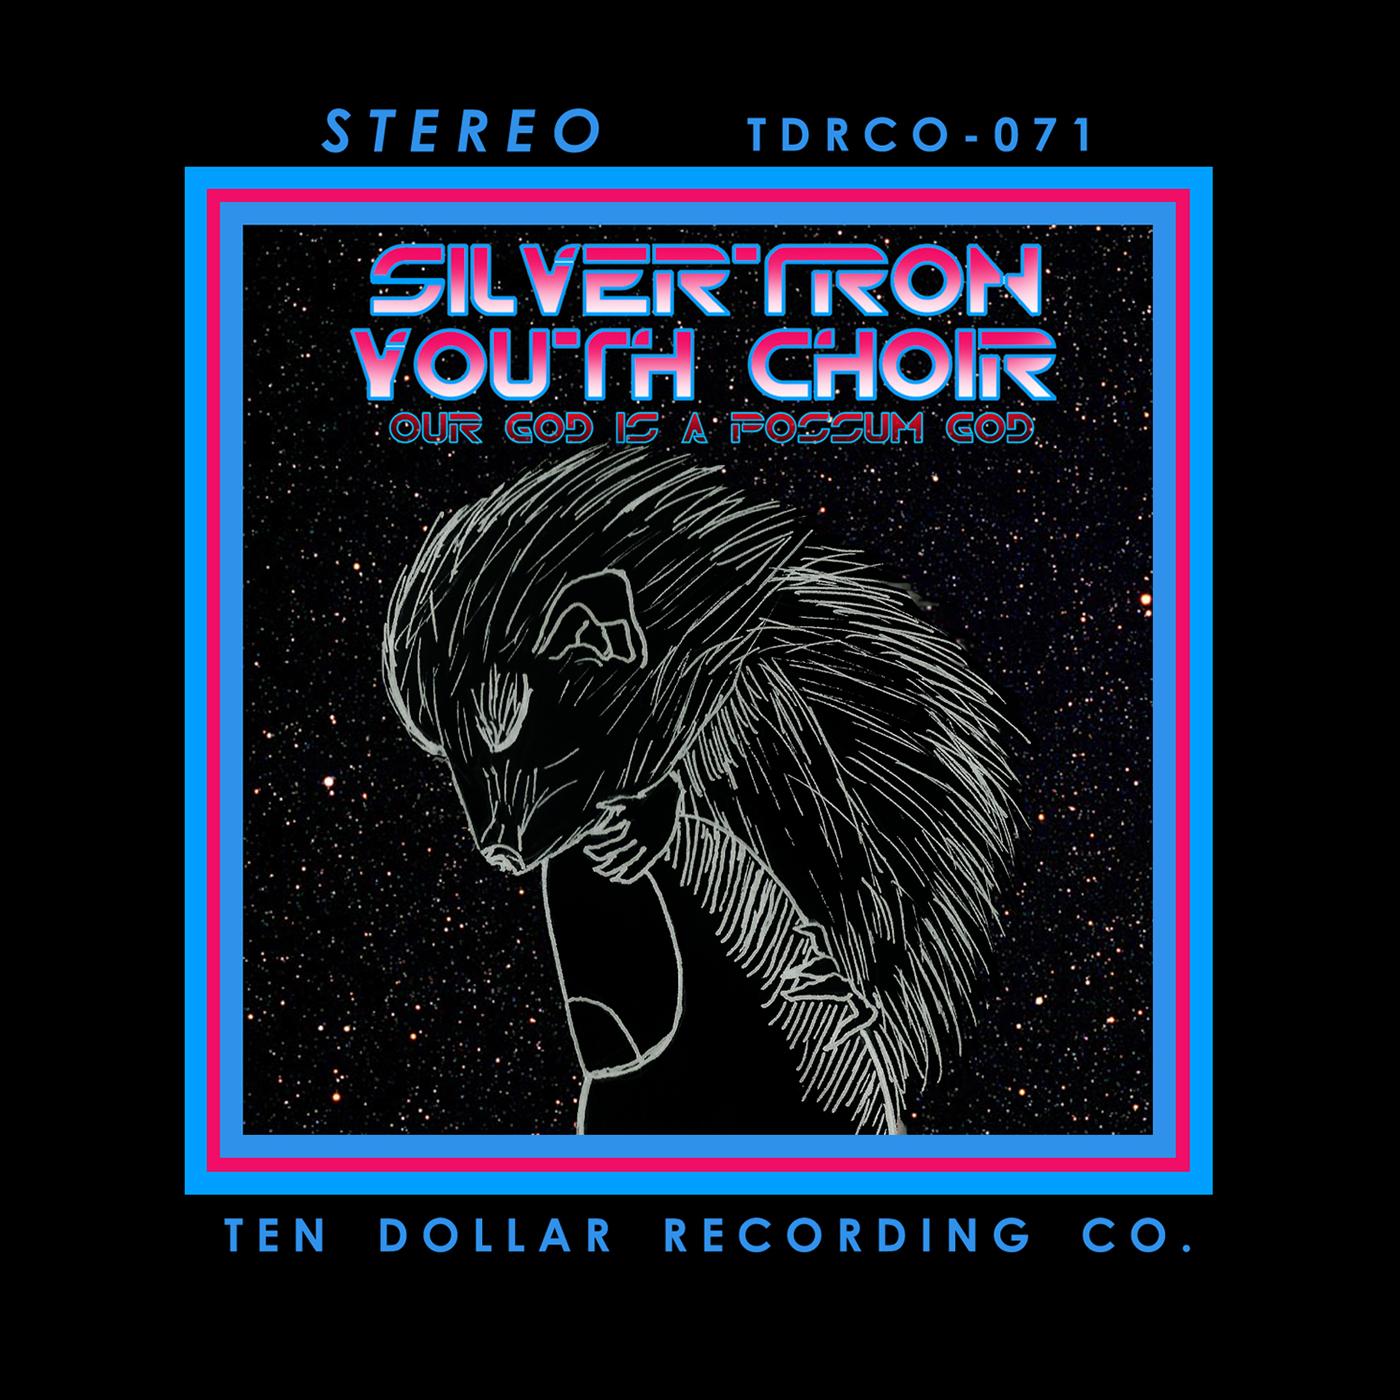 Silvertron Youth Choir - Our God is a Possum God